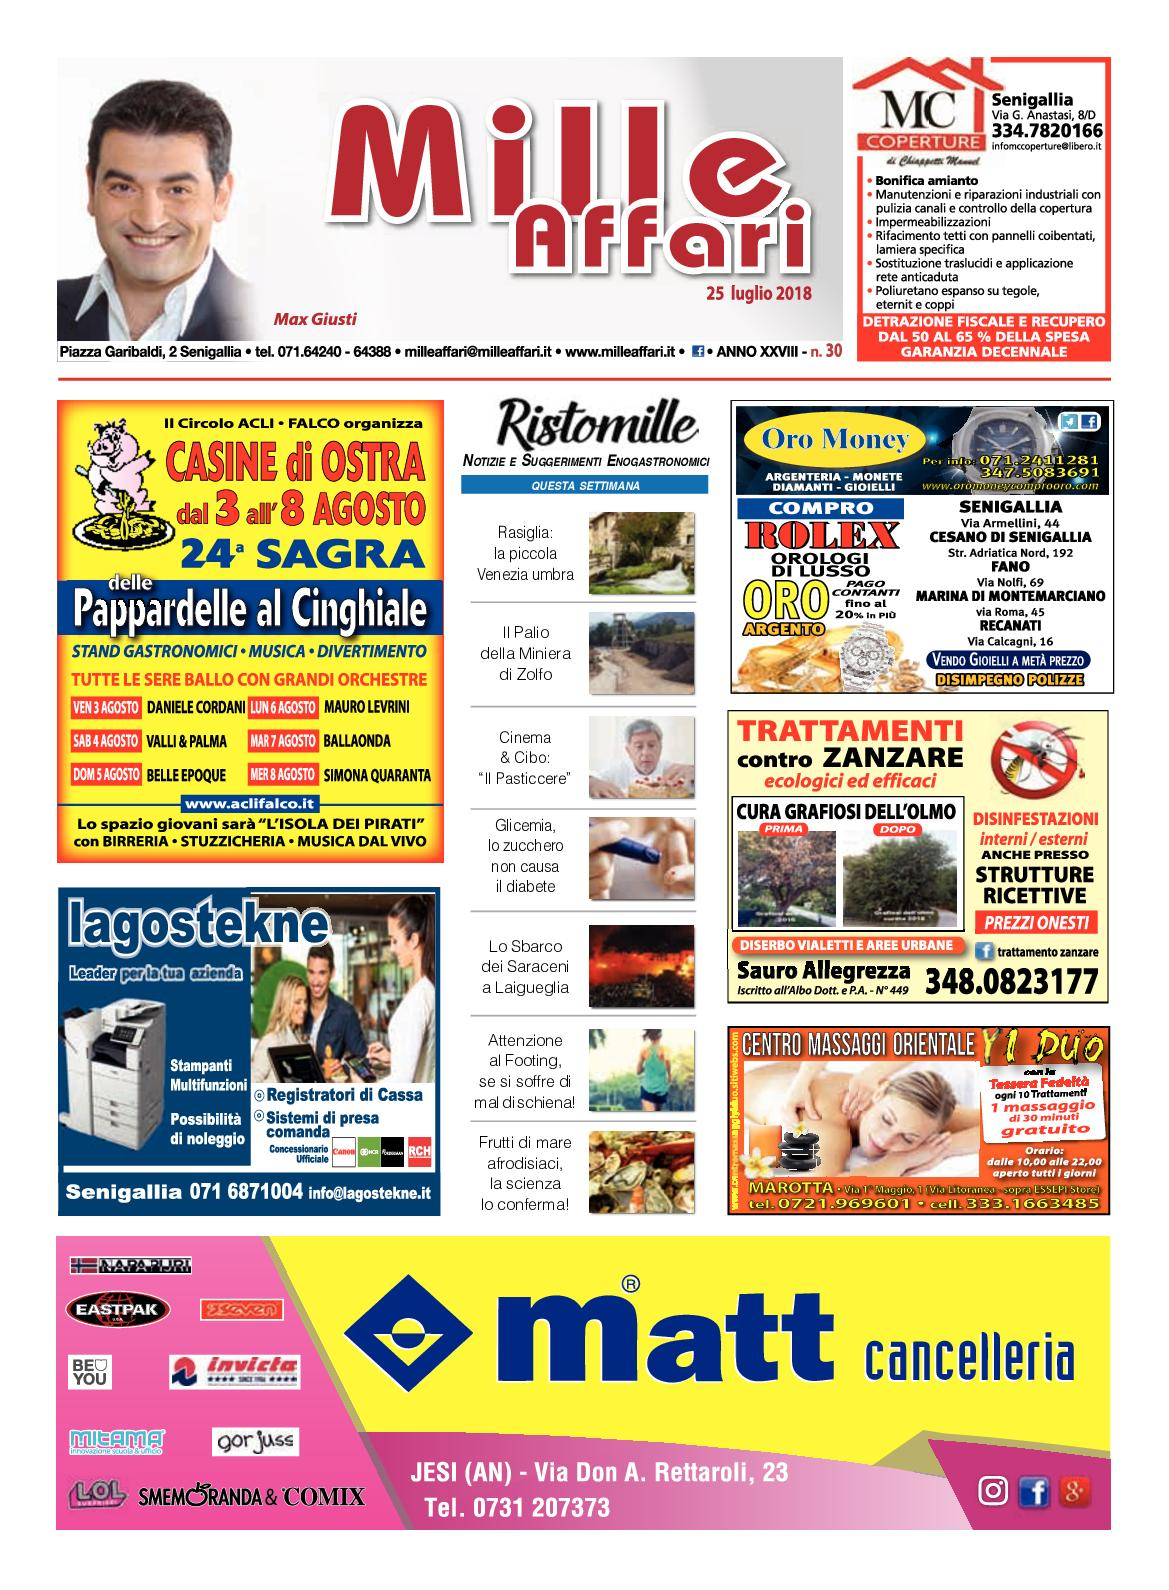 Calaméo - Milleaffari N° 30 del 25.07.18 f3f0eedae19